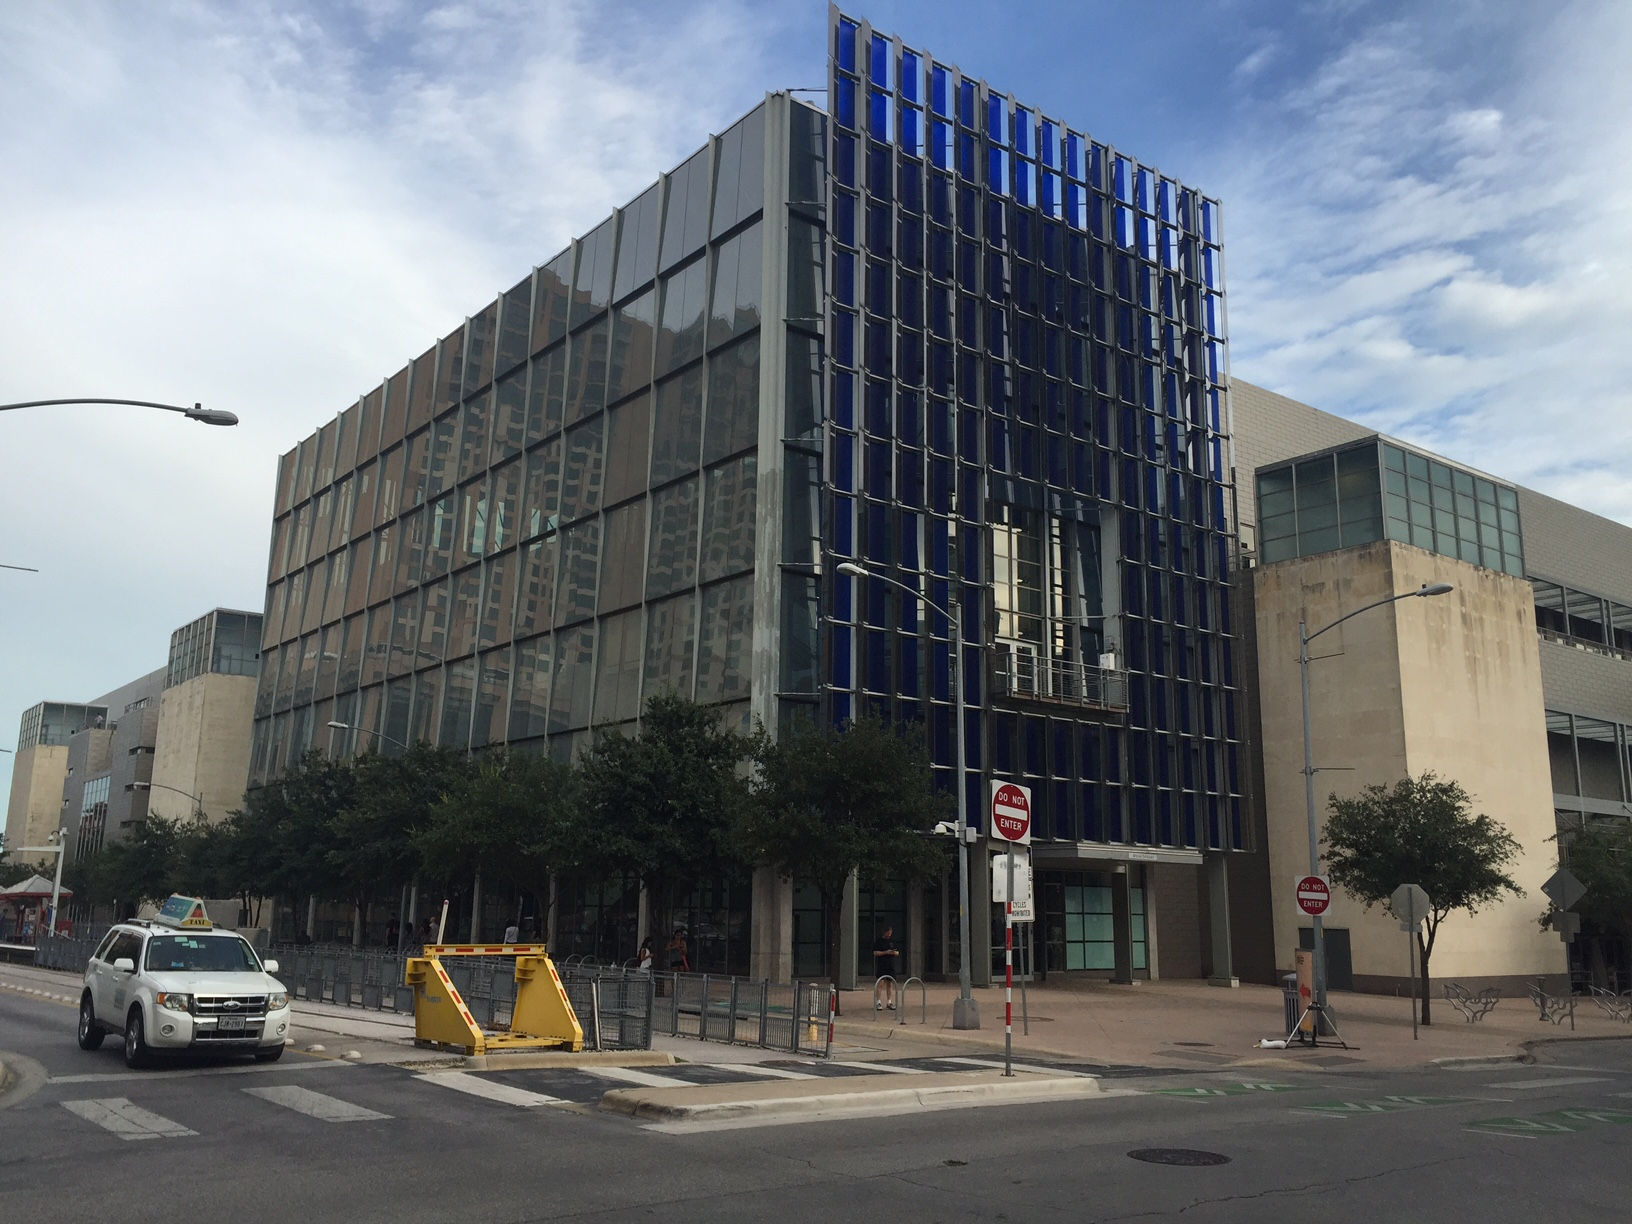 The Austin Convention Center_340133